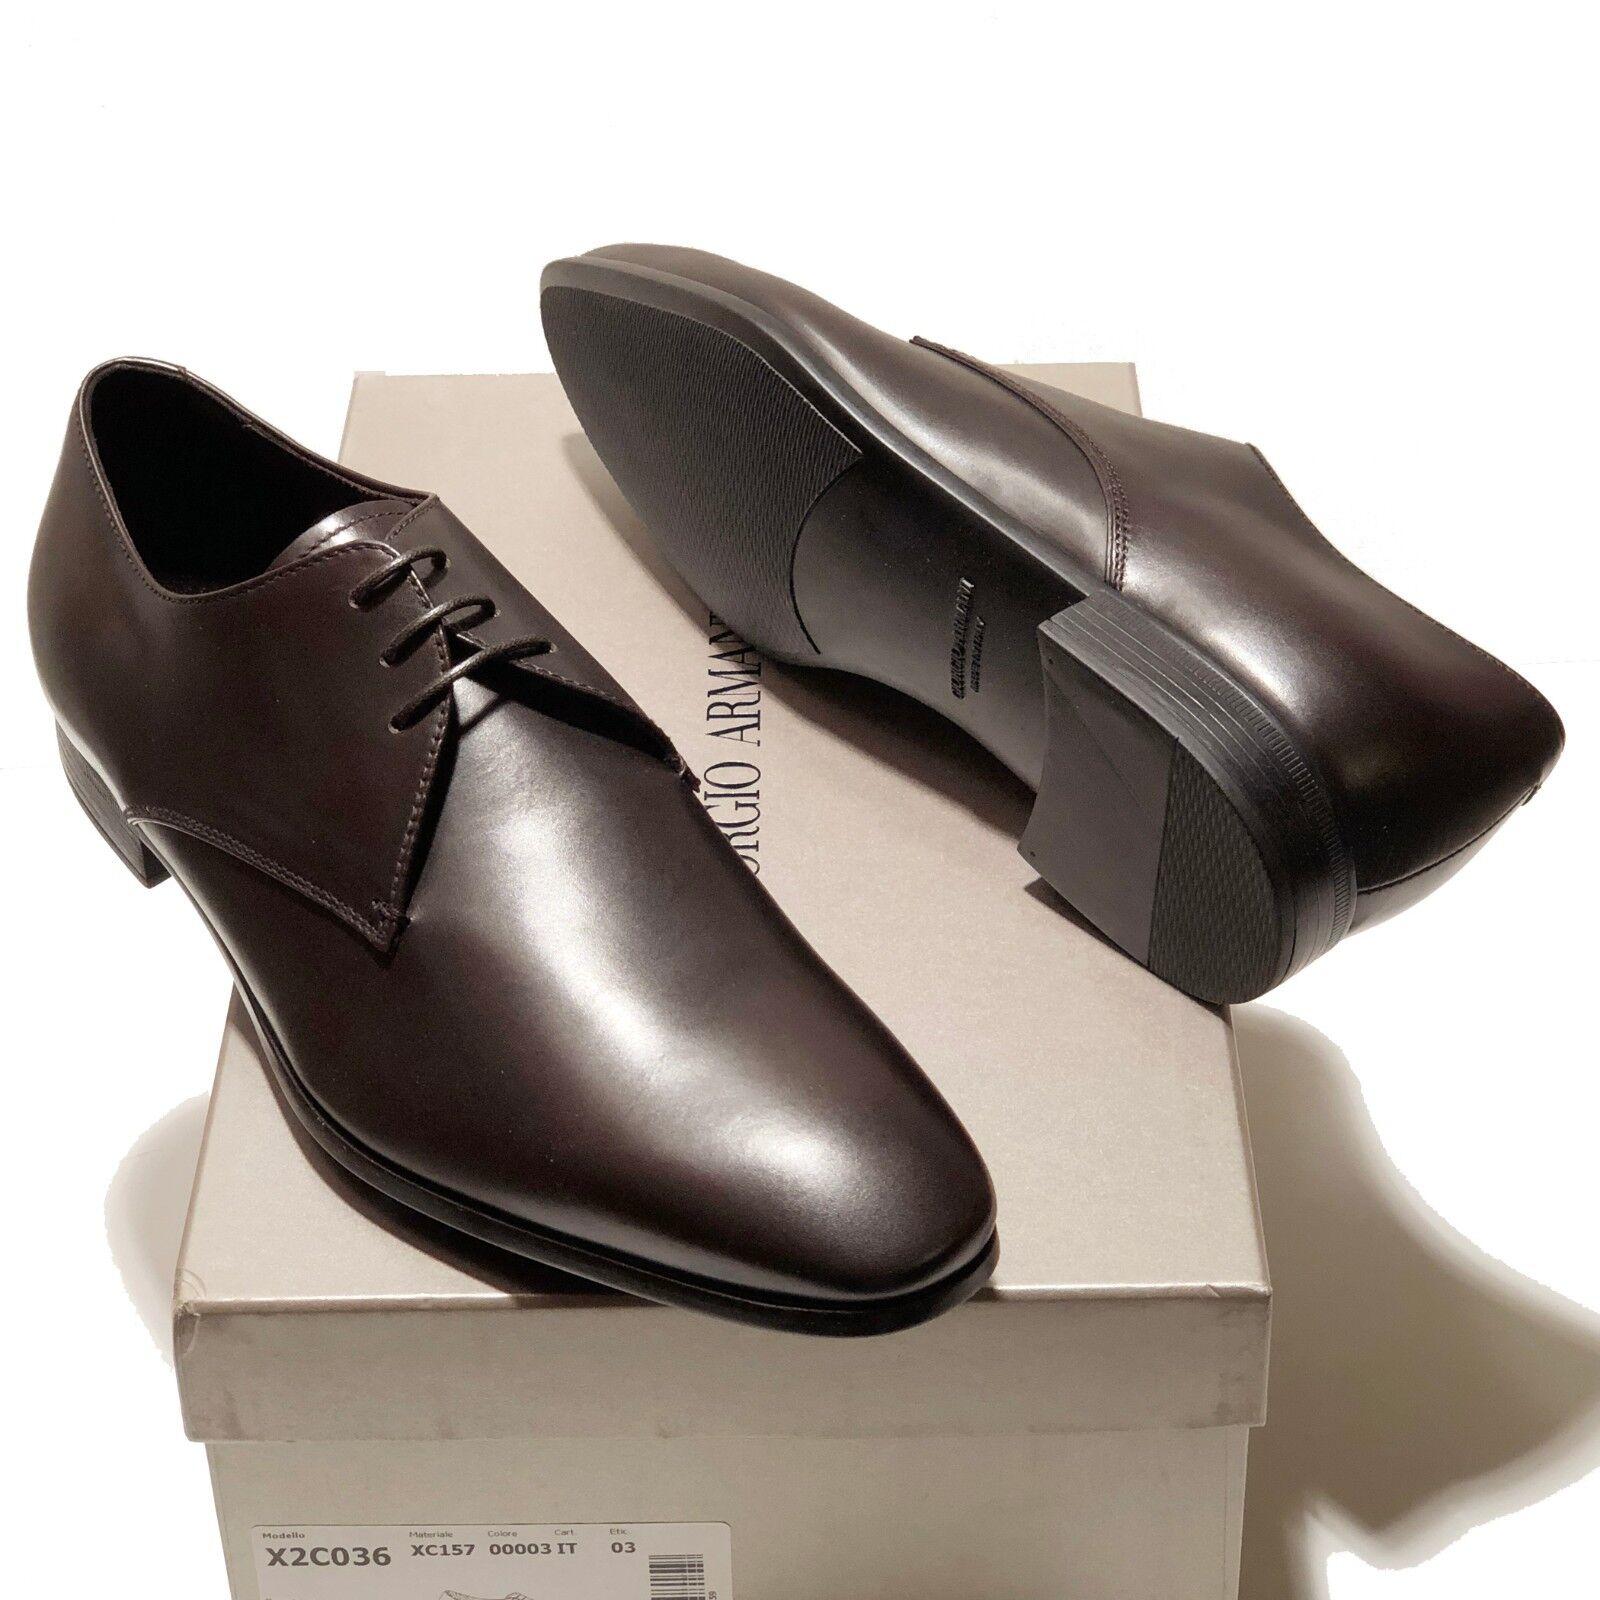 Giorgio Armani ITALY Brown Men's Leather Formal Dress Oxford Men's Brown Shoes X2C036 Tuxedo 82210e